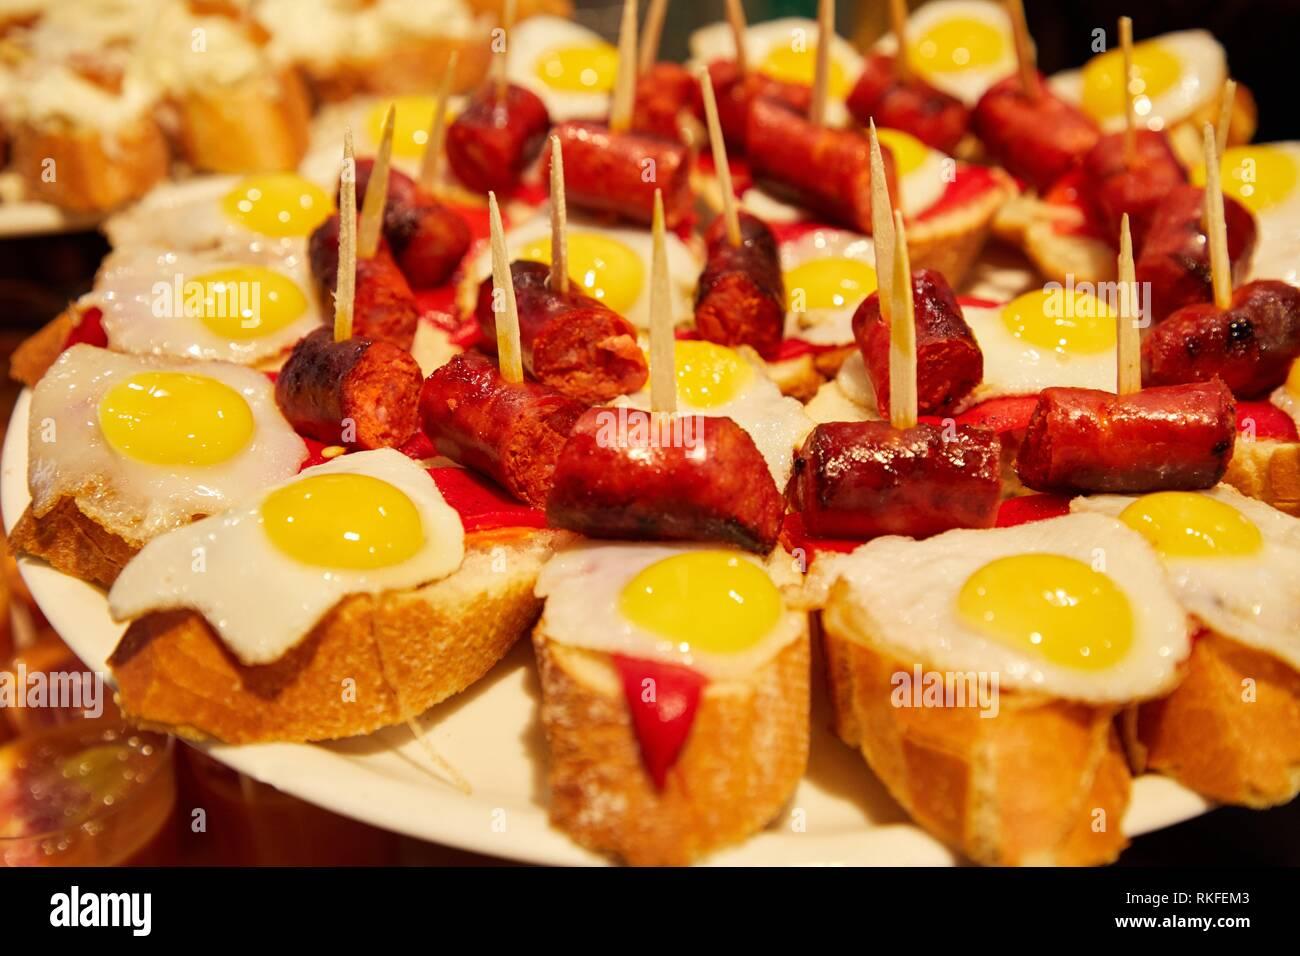 Quail egg and fried chistorra, Pintxos, Bar Taberna Aralar, Parte Vieja, Old Town, Donostia, San Sebastian, Gipuzkoa, Basque Country, Spain - Stock Image